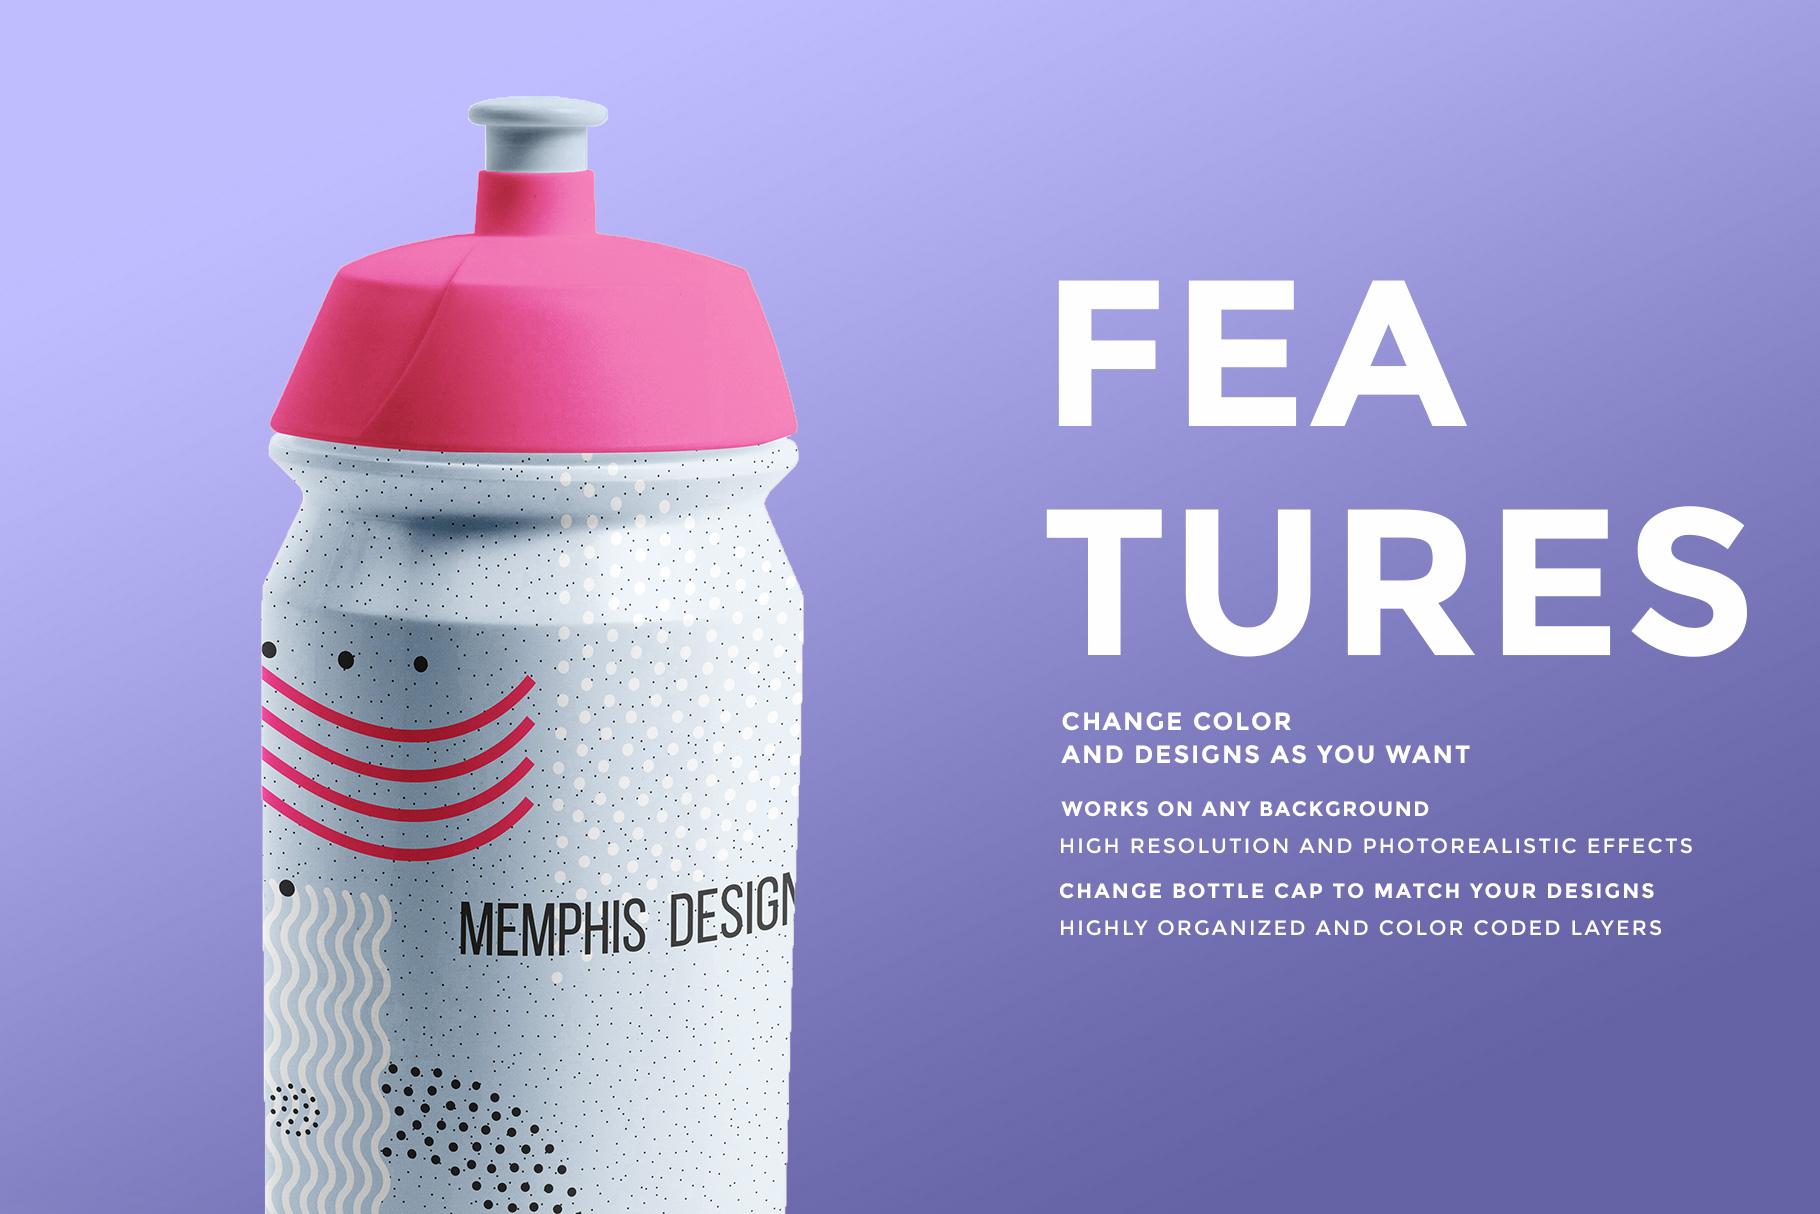 features of the biker water bottle mockup